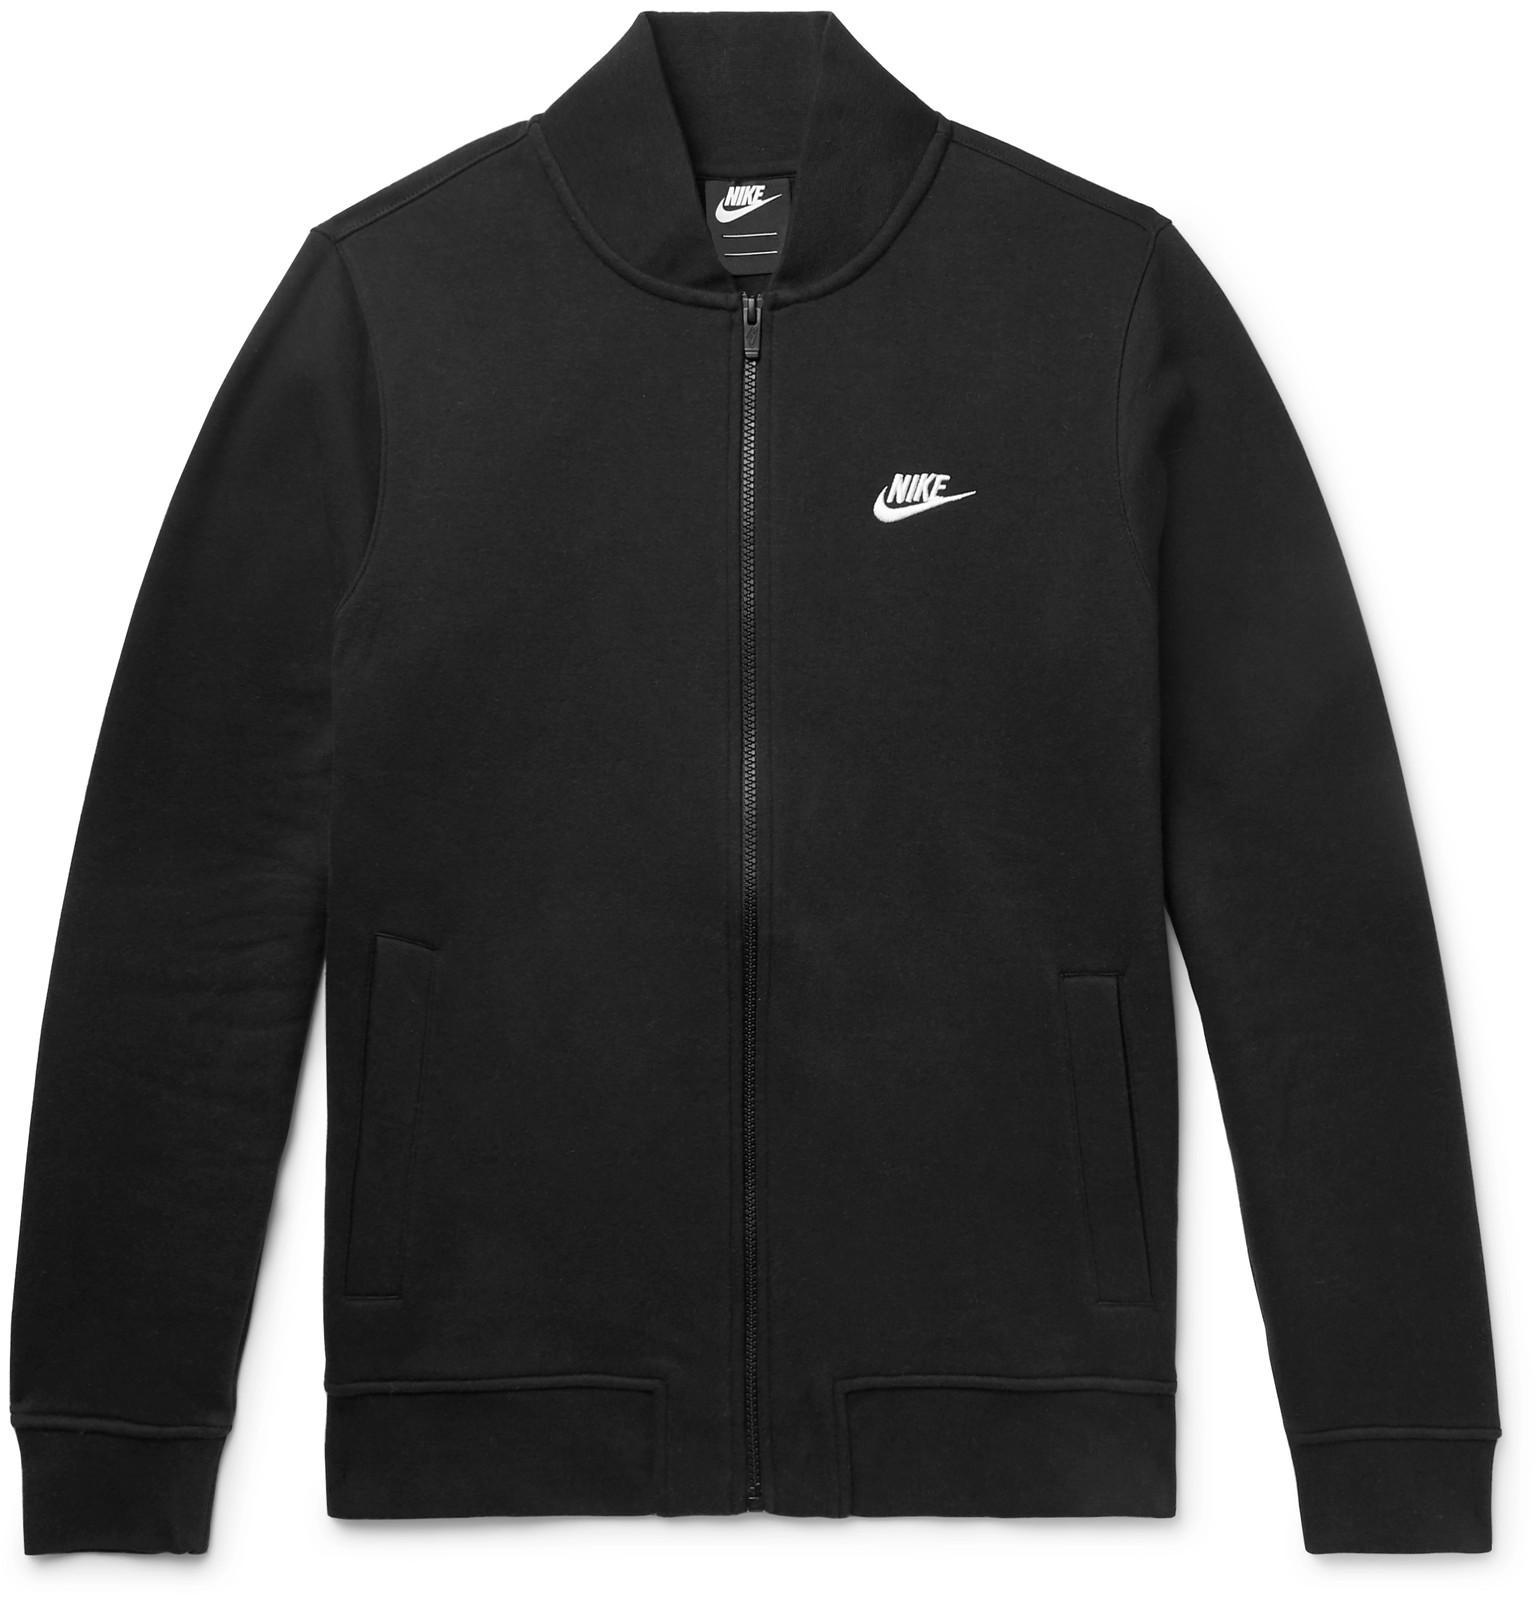 separation shoes c0de0 7f31f nike-black-Slim-fit-Fleece-back-Cotton-blend-Jersey-Zip-up-Sweatshirt.jpeg